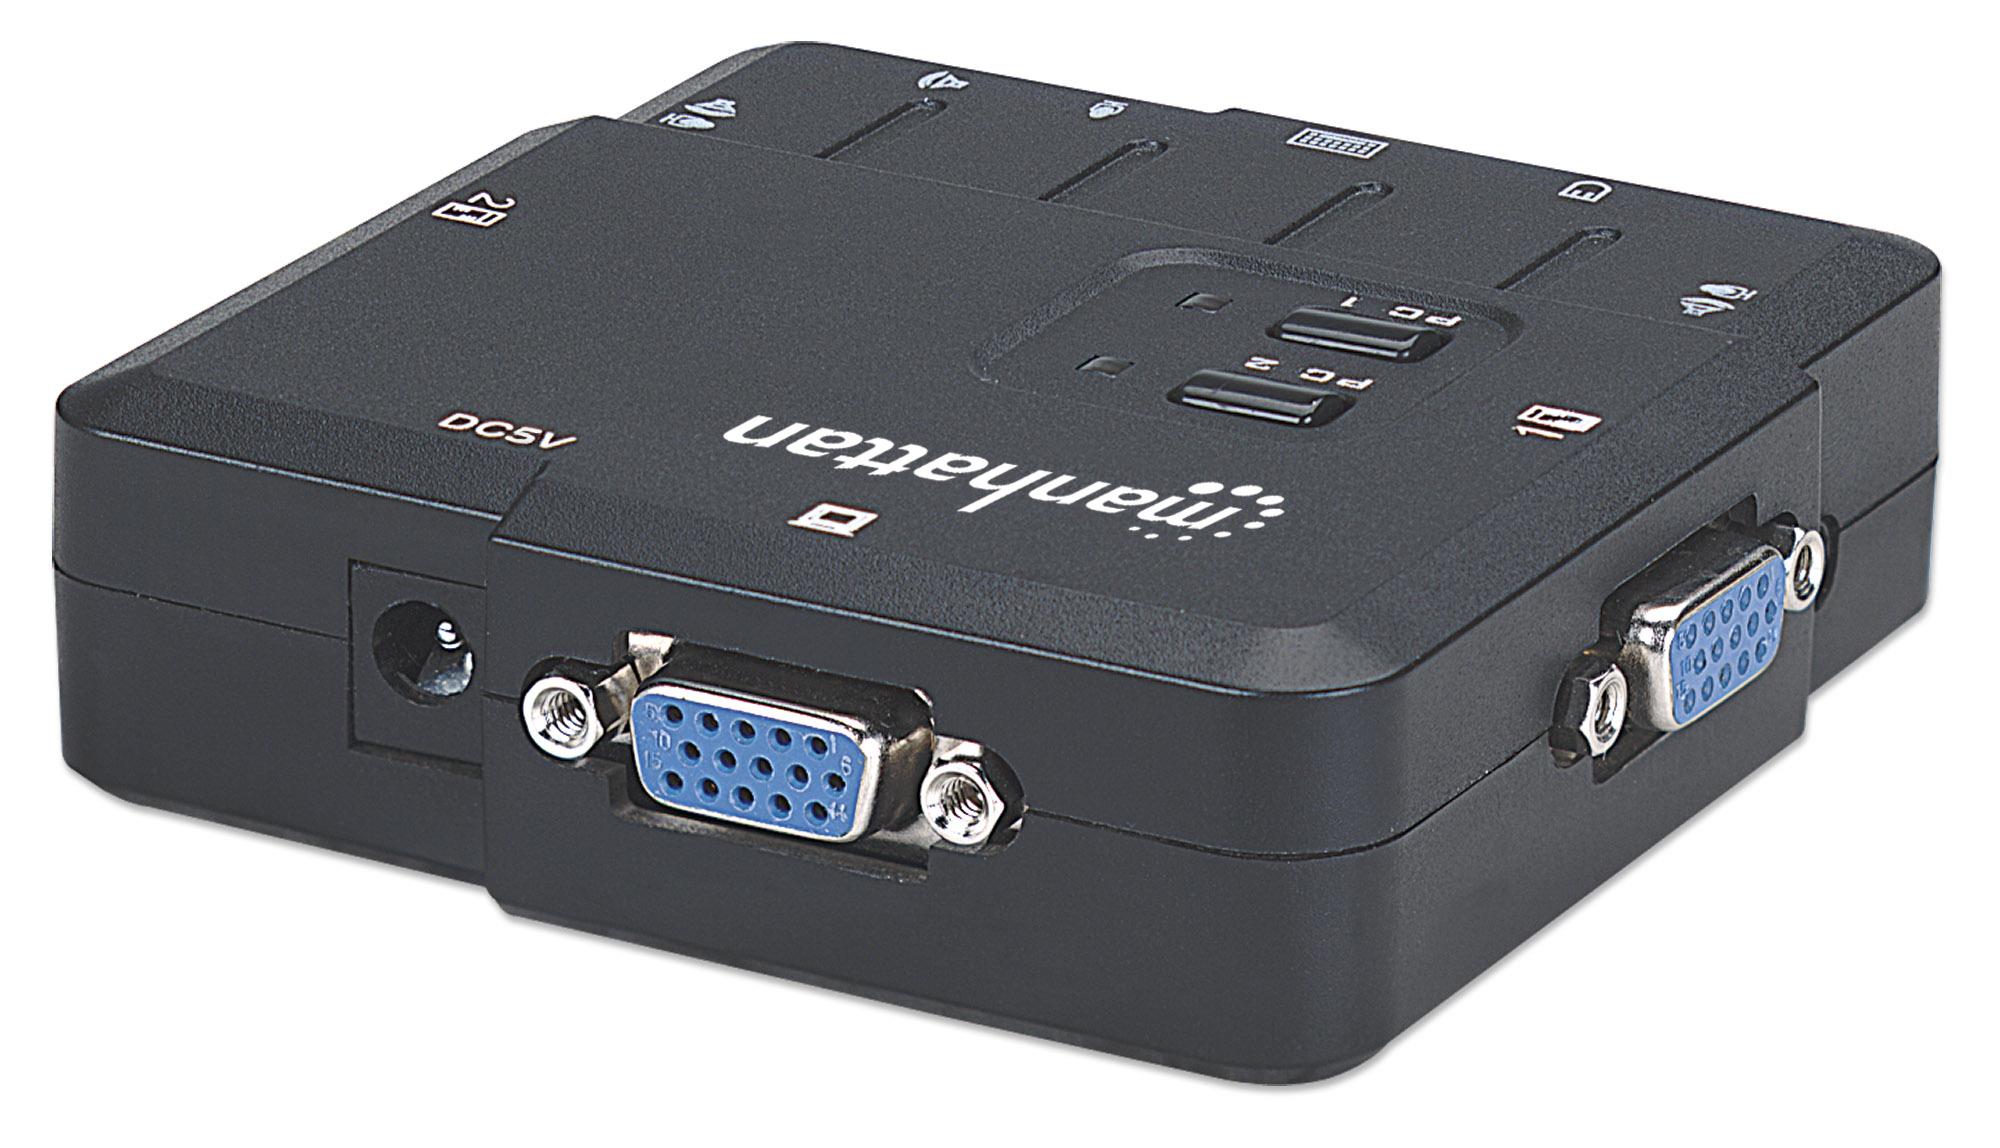 2-Port Compact KVM Switch